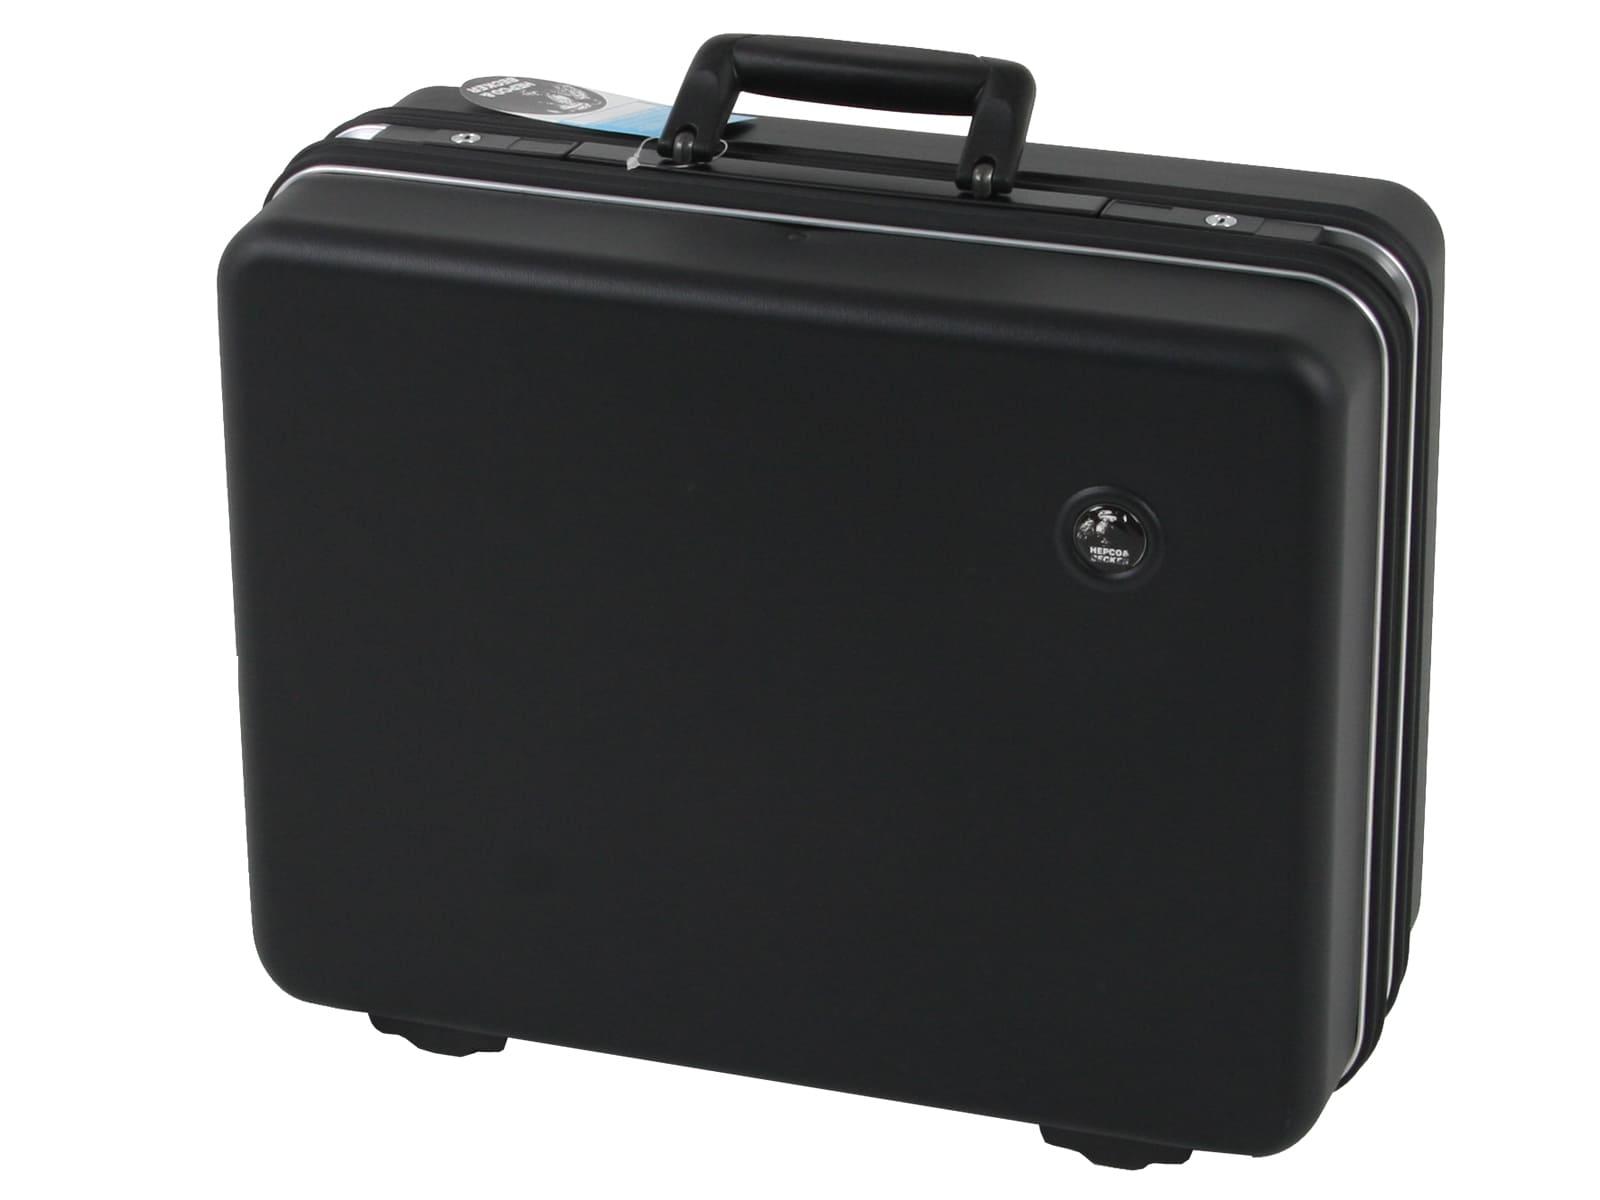 Werkzeugkoffer Classic 5182 ABS Pro 25 ltr. XL Leerkoffer